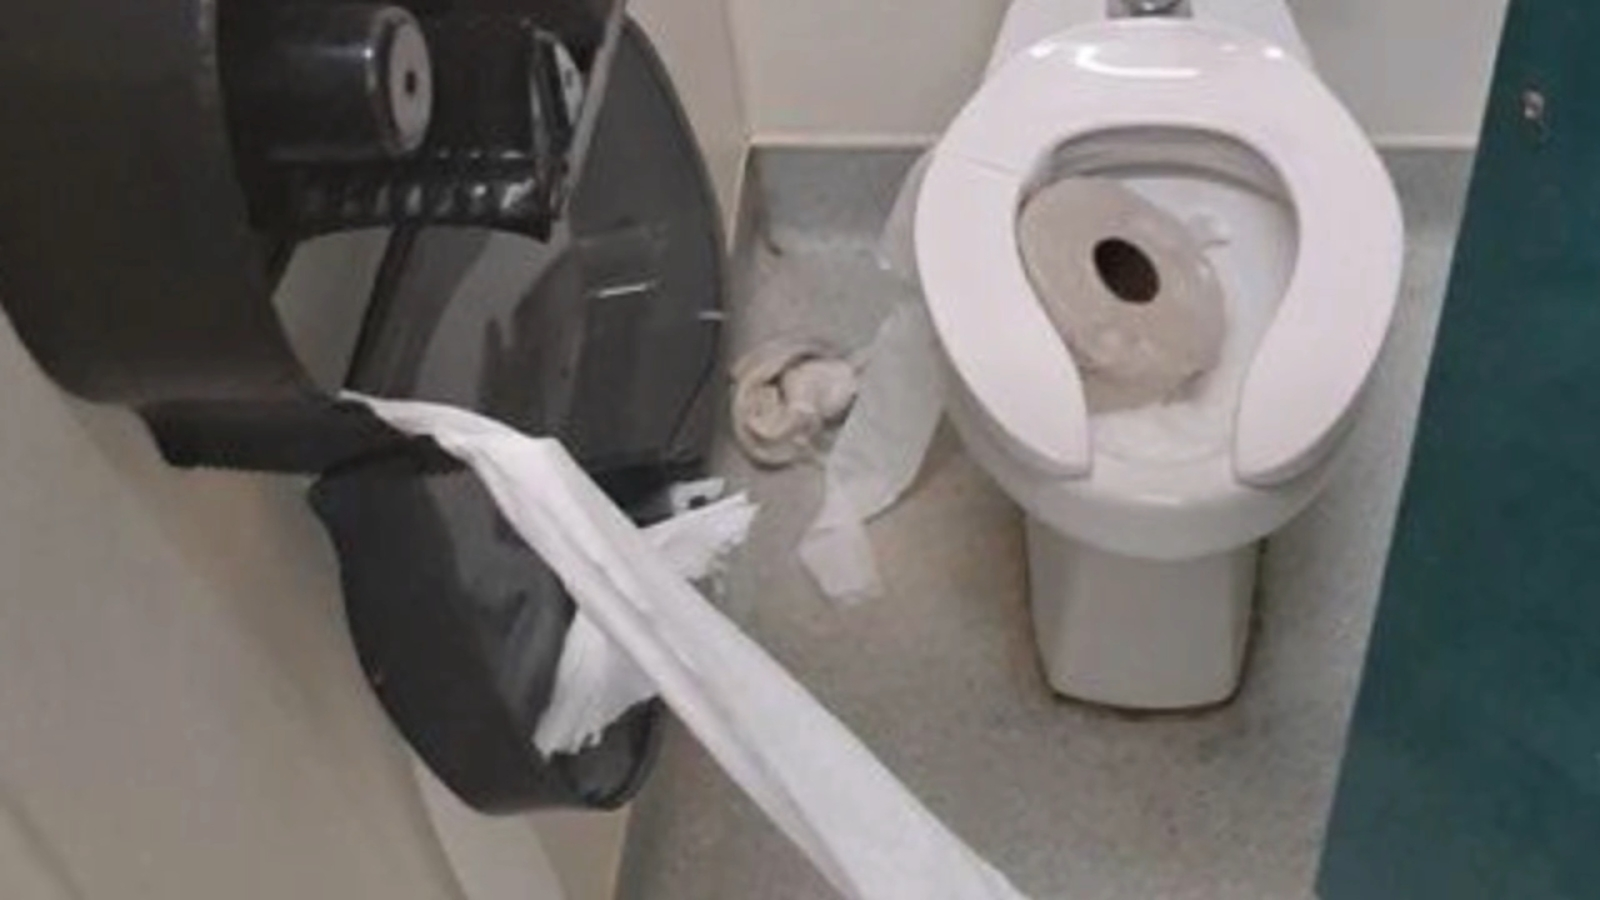 Students at multiple Bay Area schools vandalizing bathrooms after <b>TikTok</b> challenge - ABC7 ... thumbnail